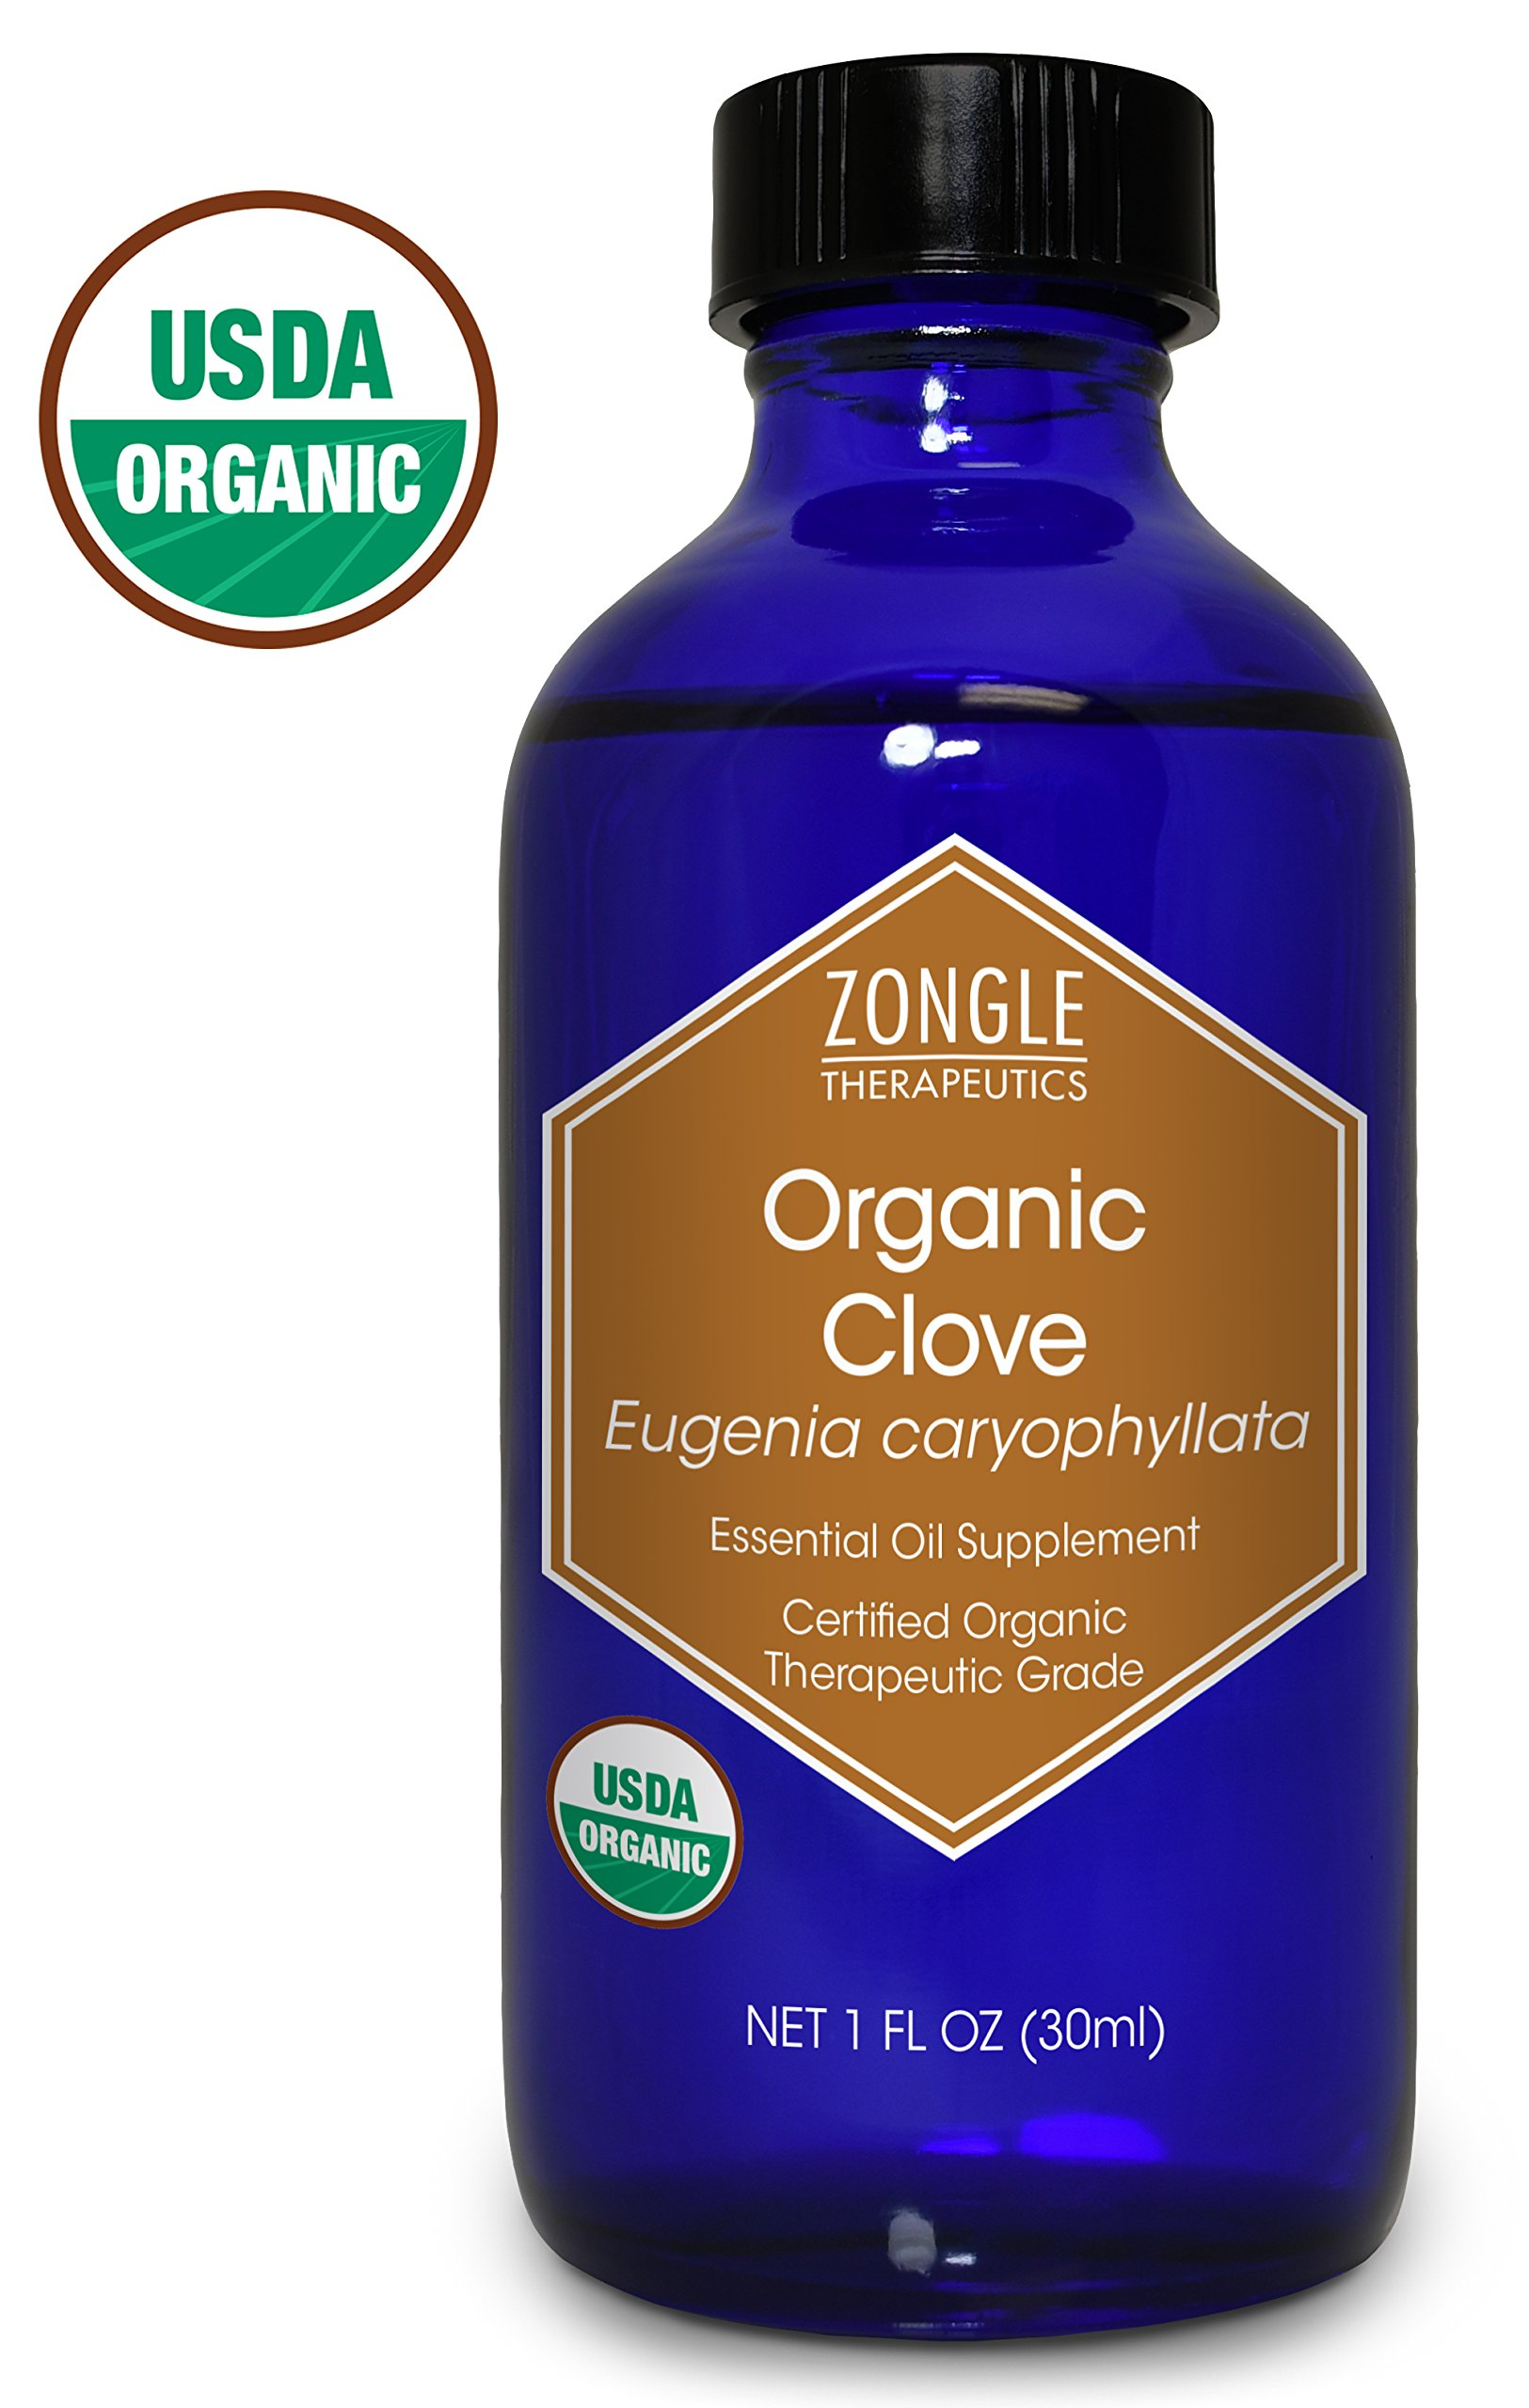 Zongle USDA Certified Organic Clove Essential Oil, Safe to Ingest, Eugenia Caryophyllata, 1 oz